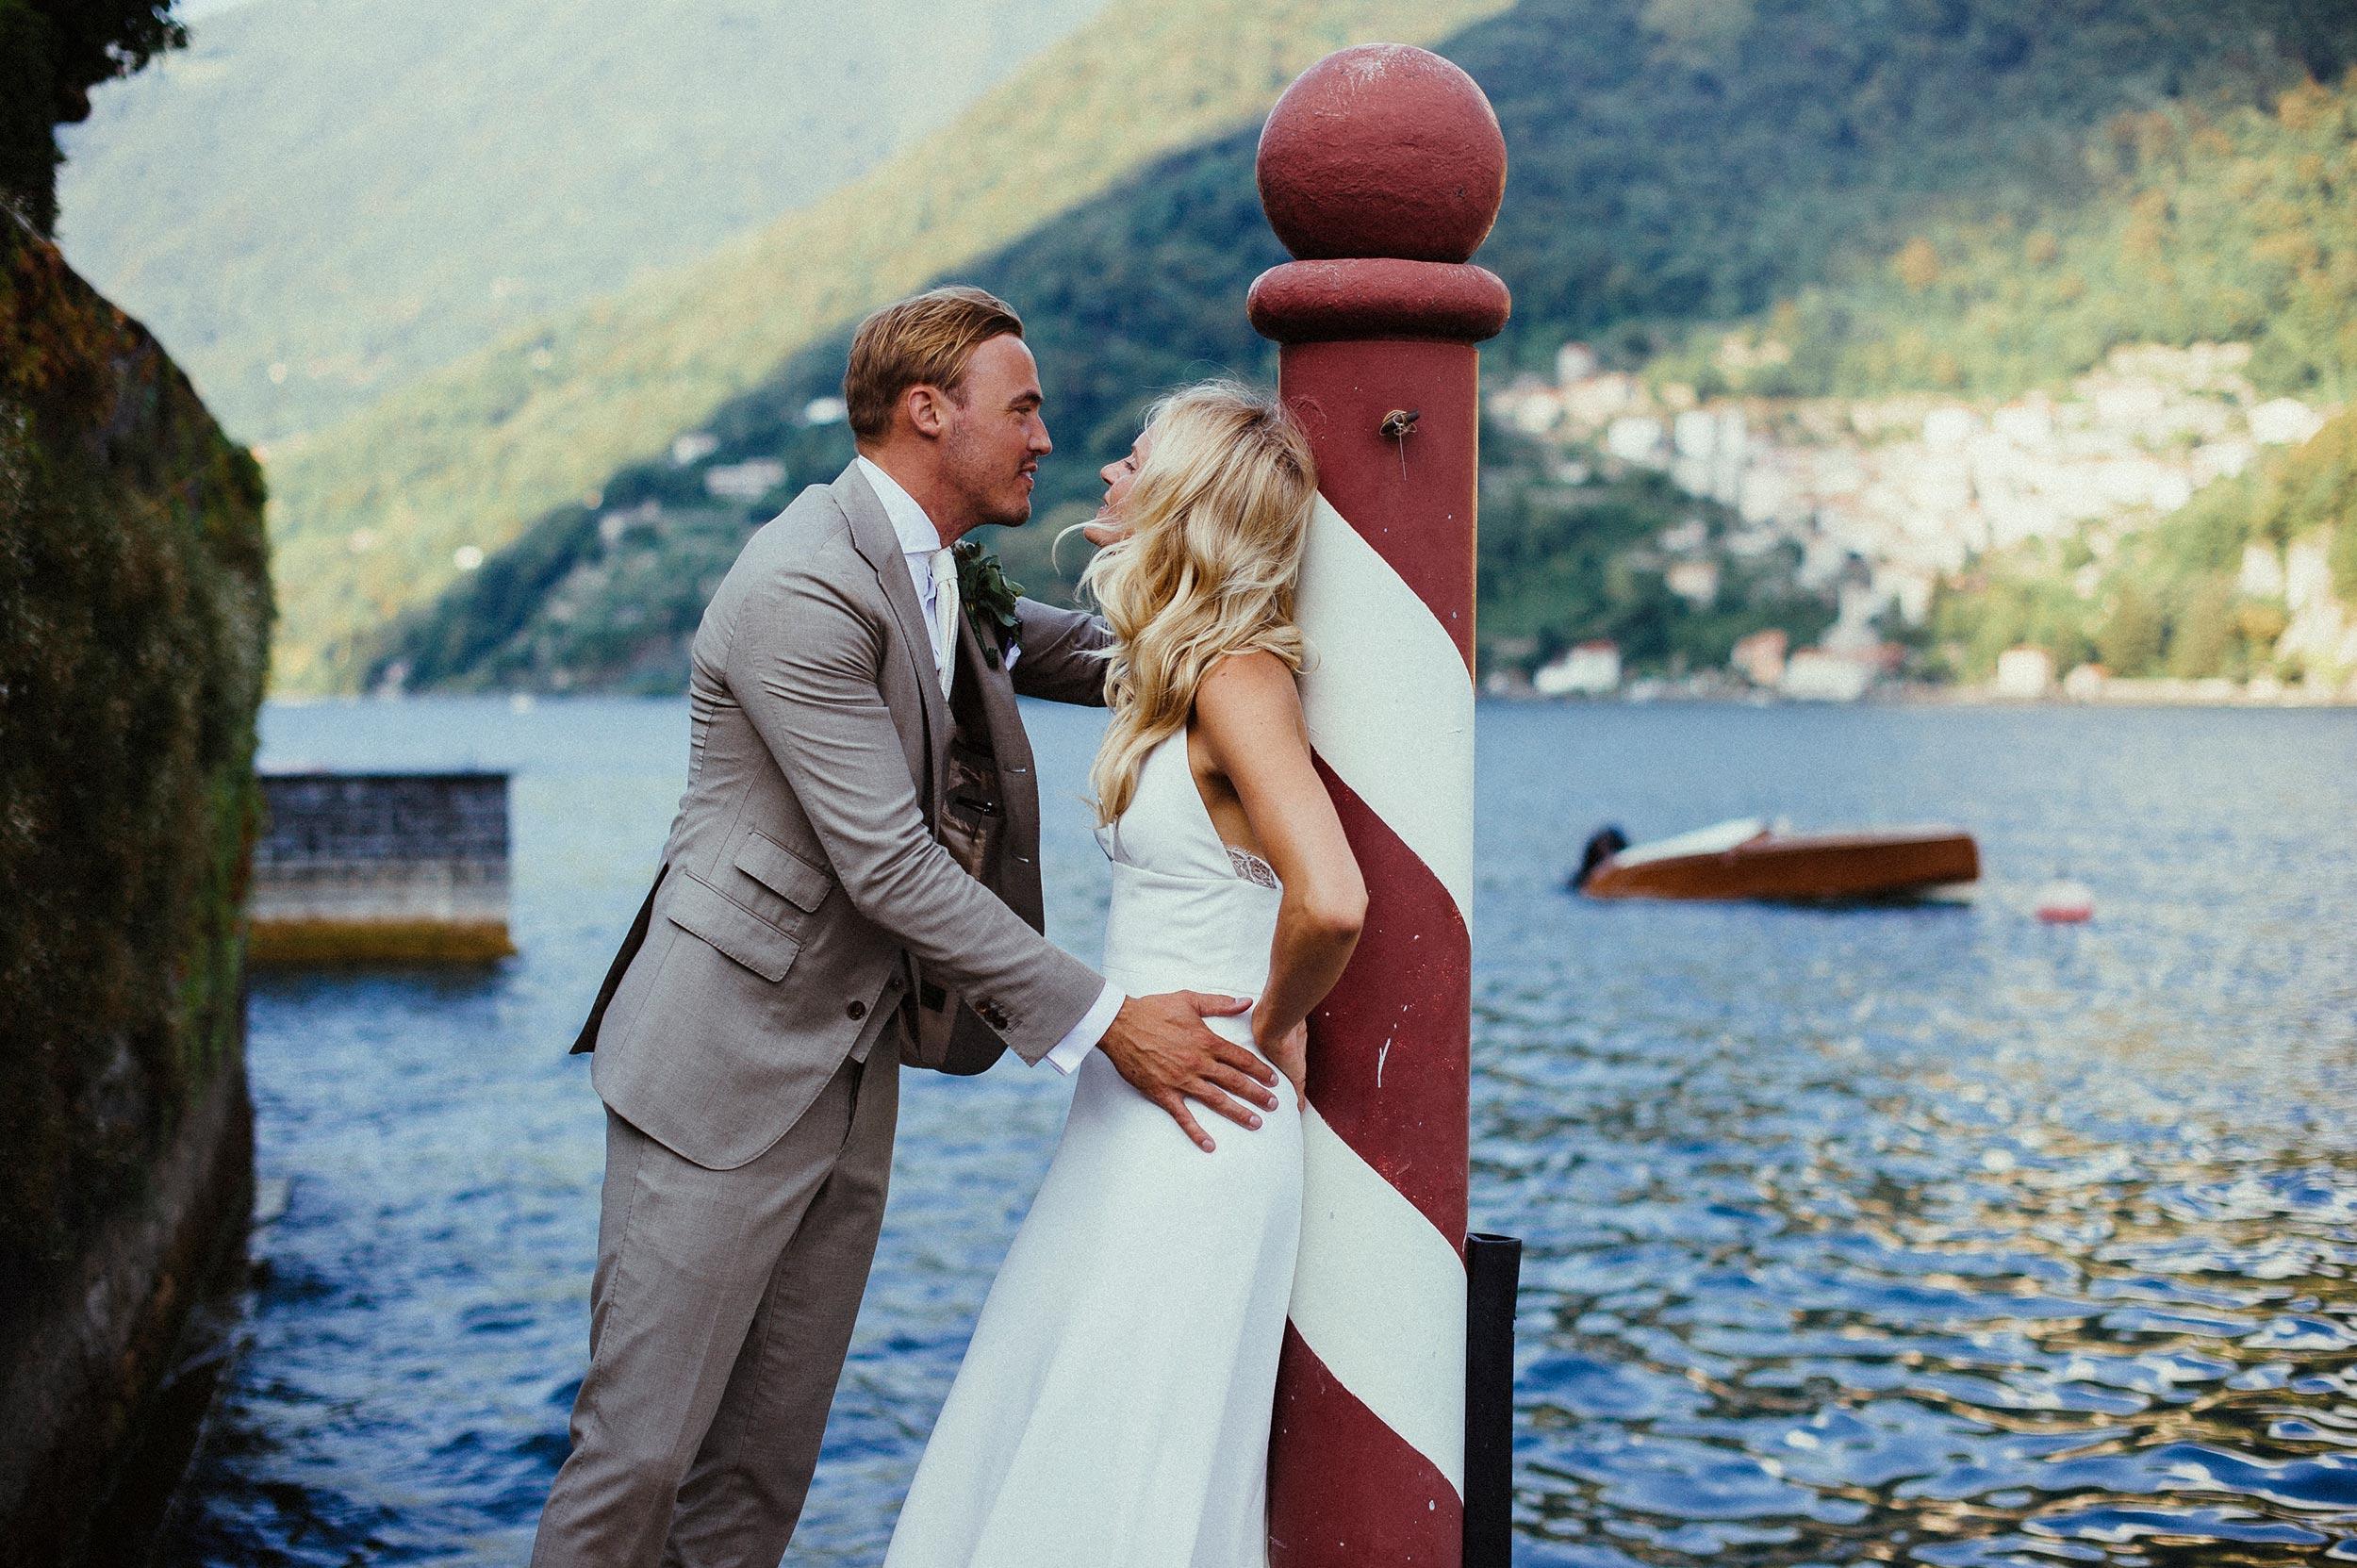 2018-Villa-Regina-Teodolinda-Lake-Como-Wedding-Photographer-Italy-Alessandro-Avenali-235.jpg